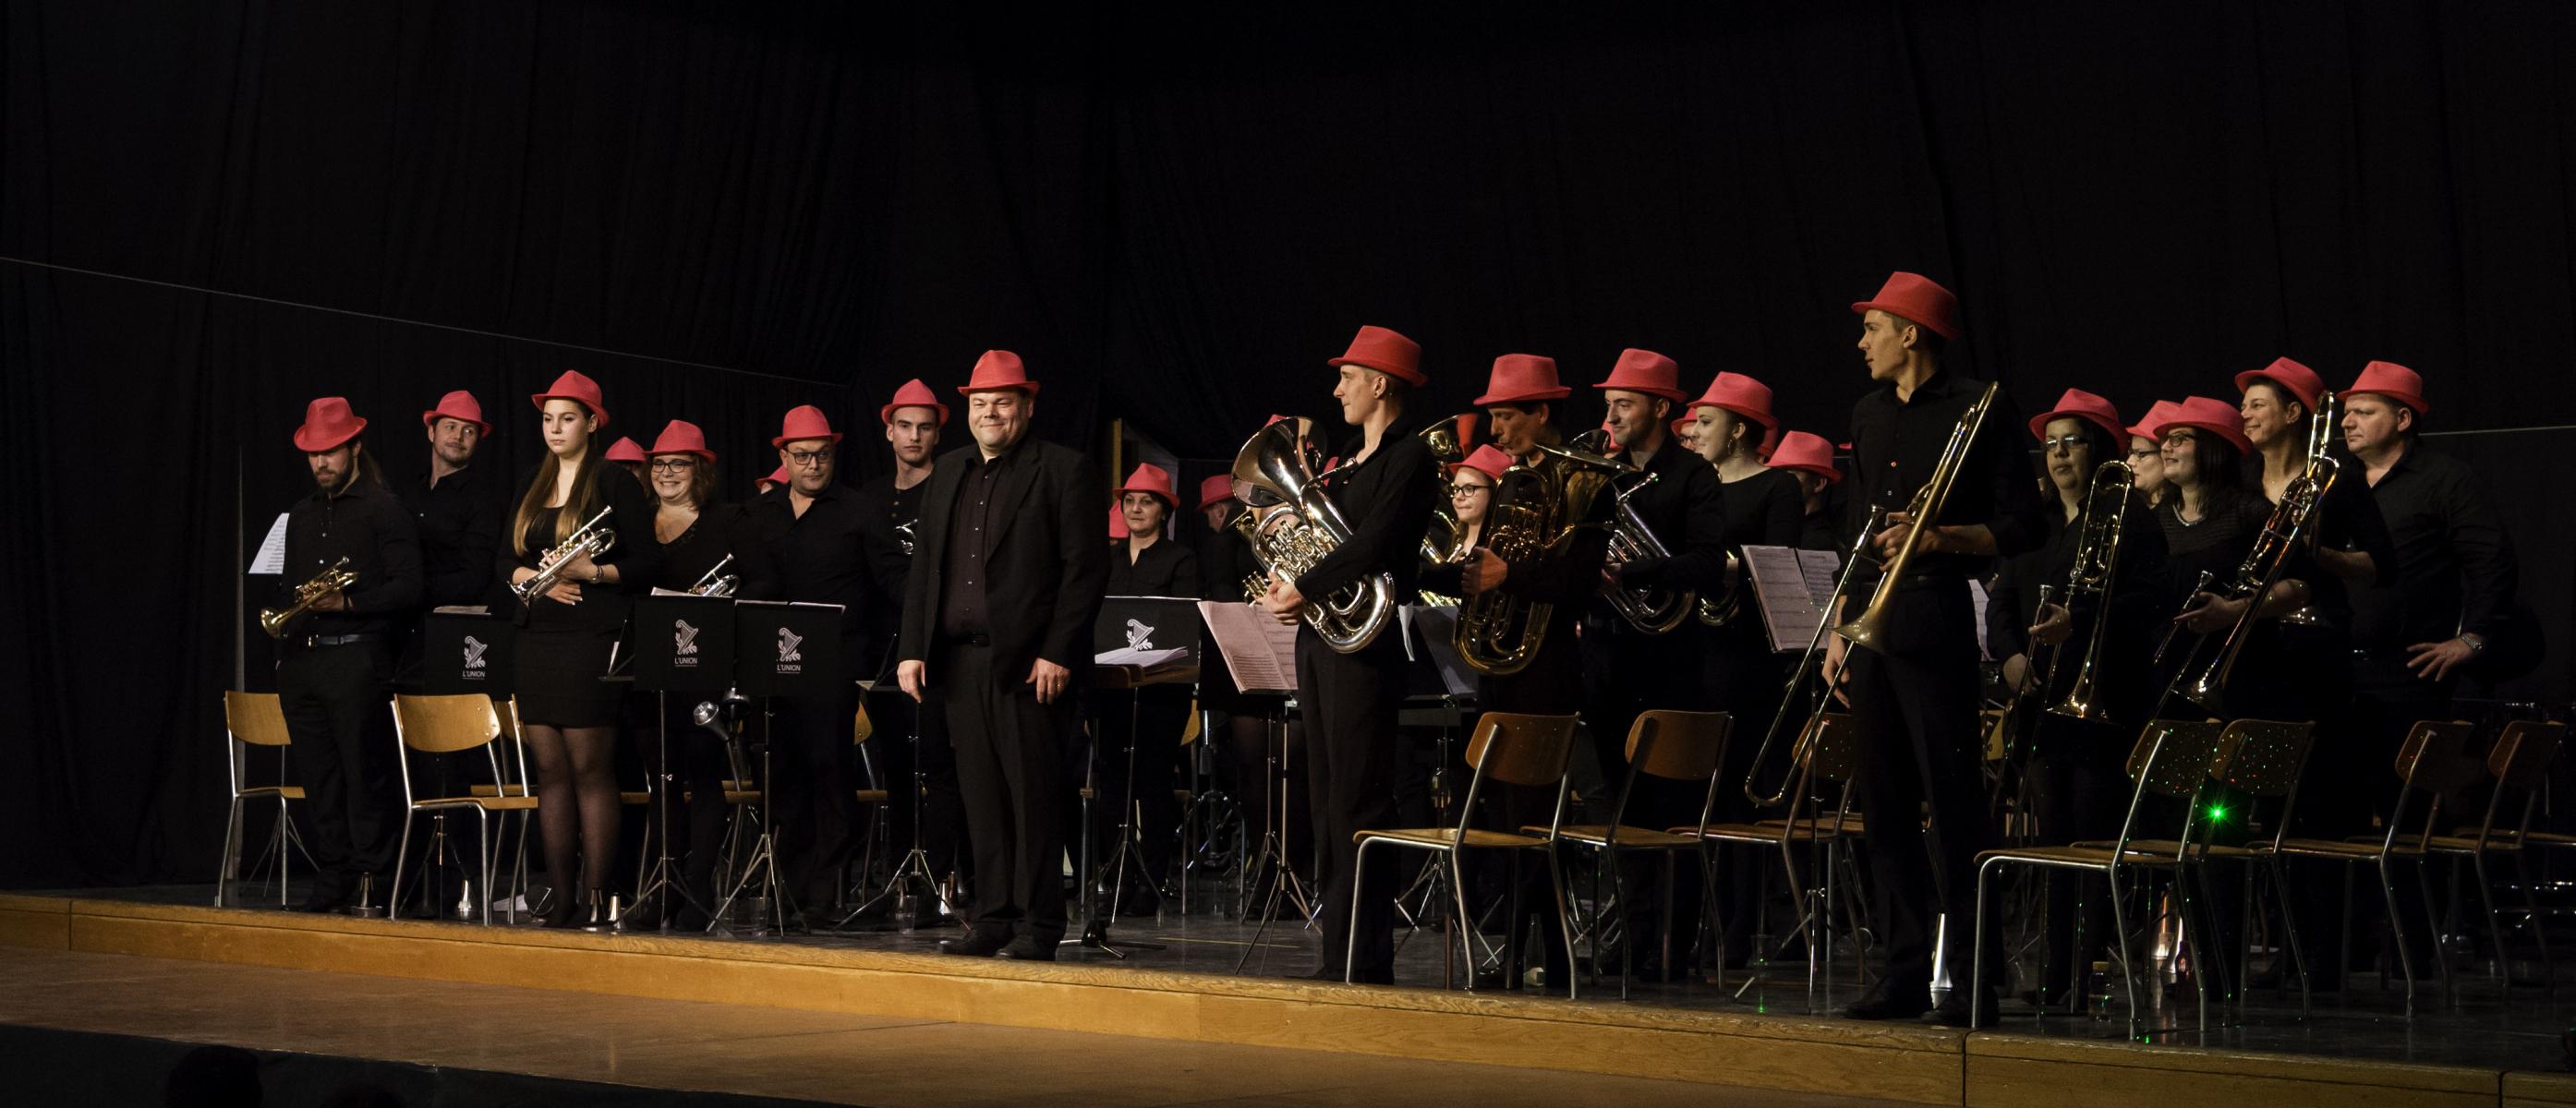 170211_concert_annuel17-071